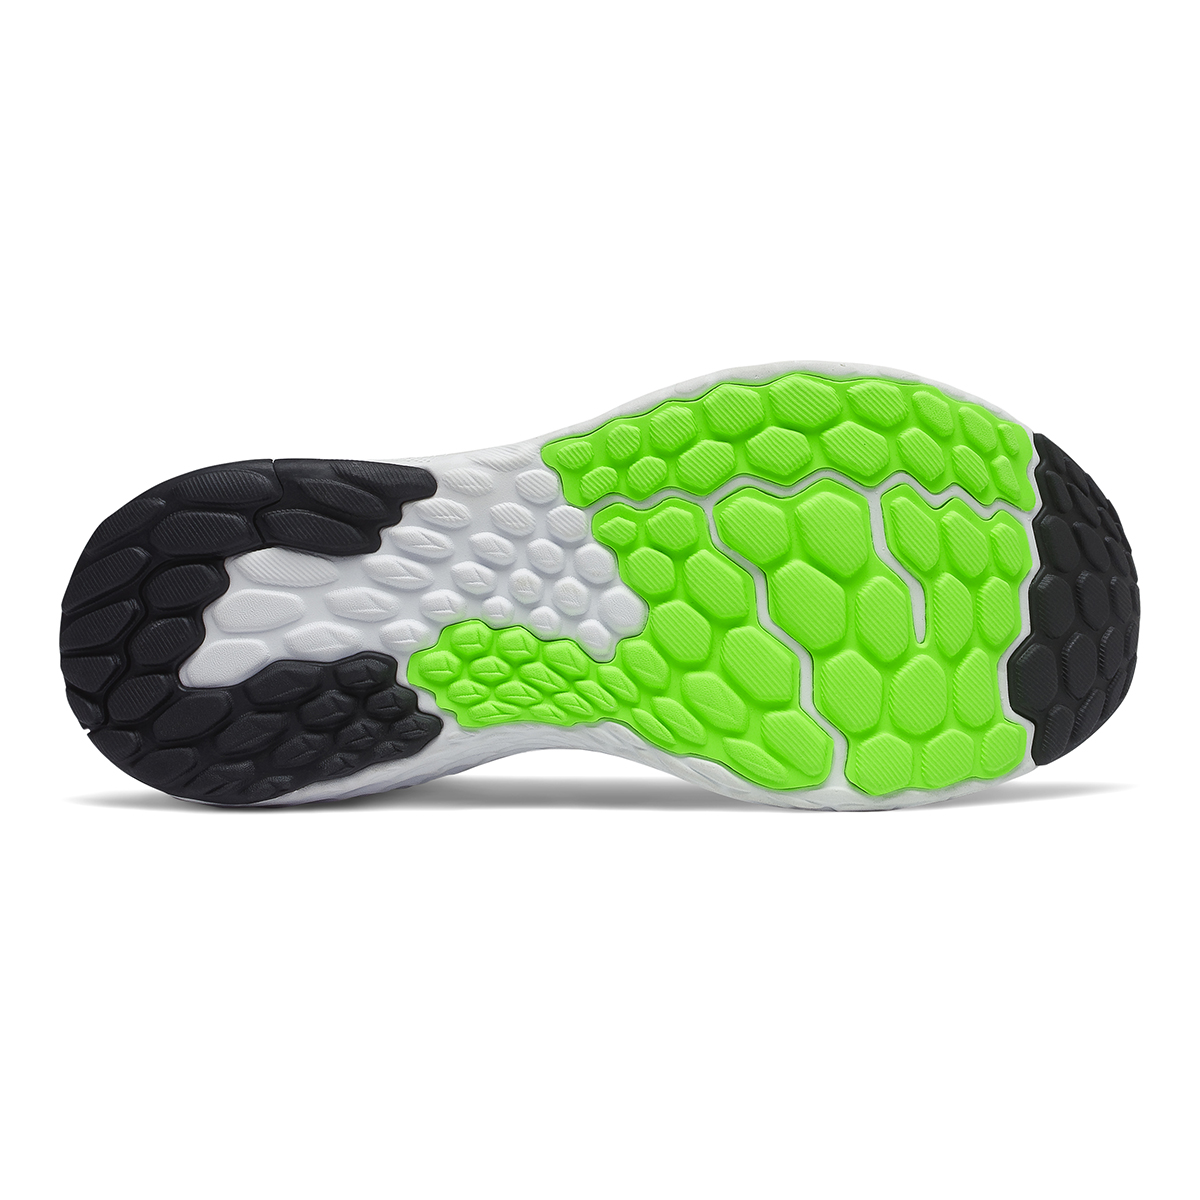 Men's New Balance Fresh Foam 1080v10 Running Shoe, , large, image 4